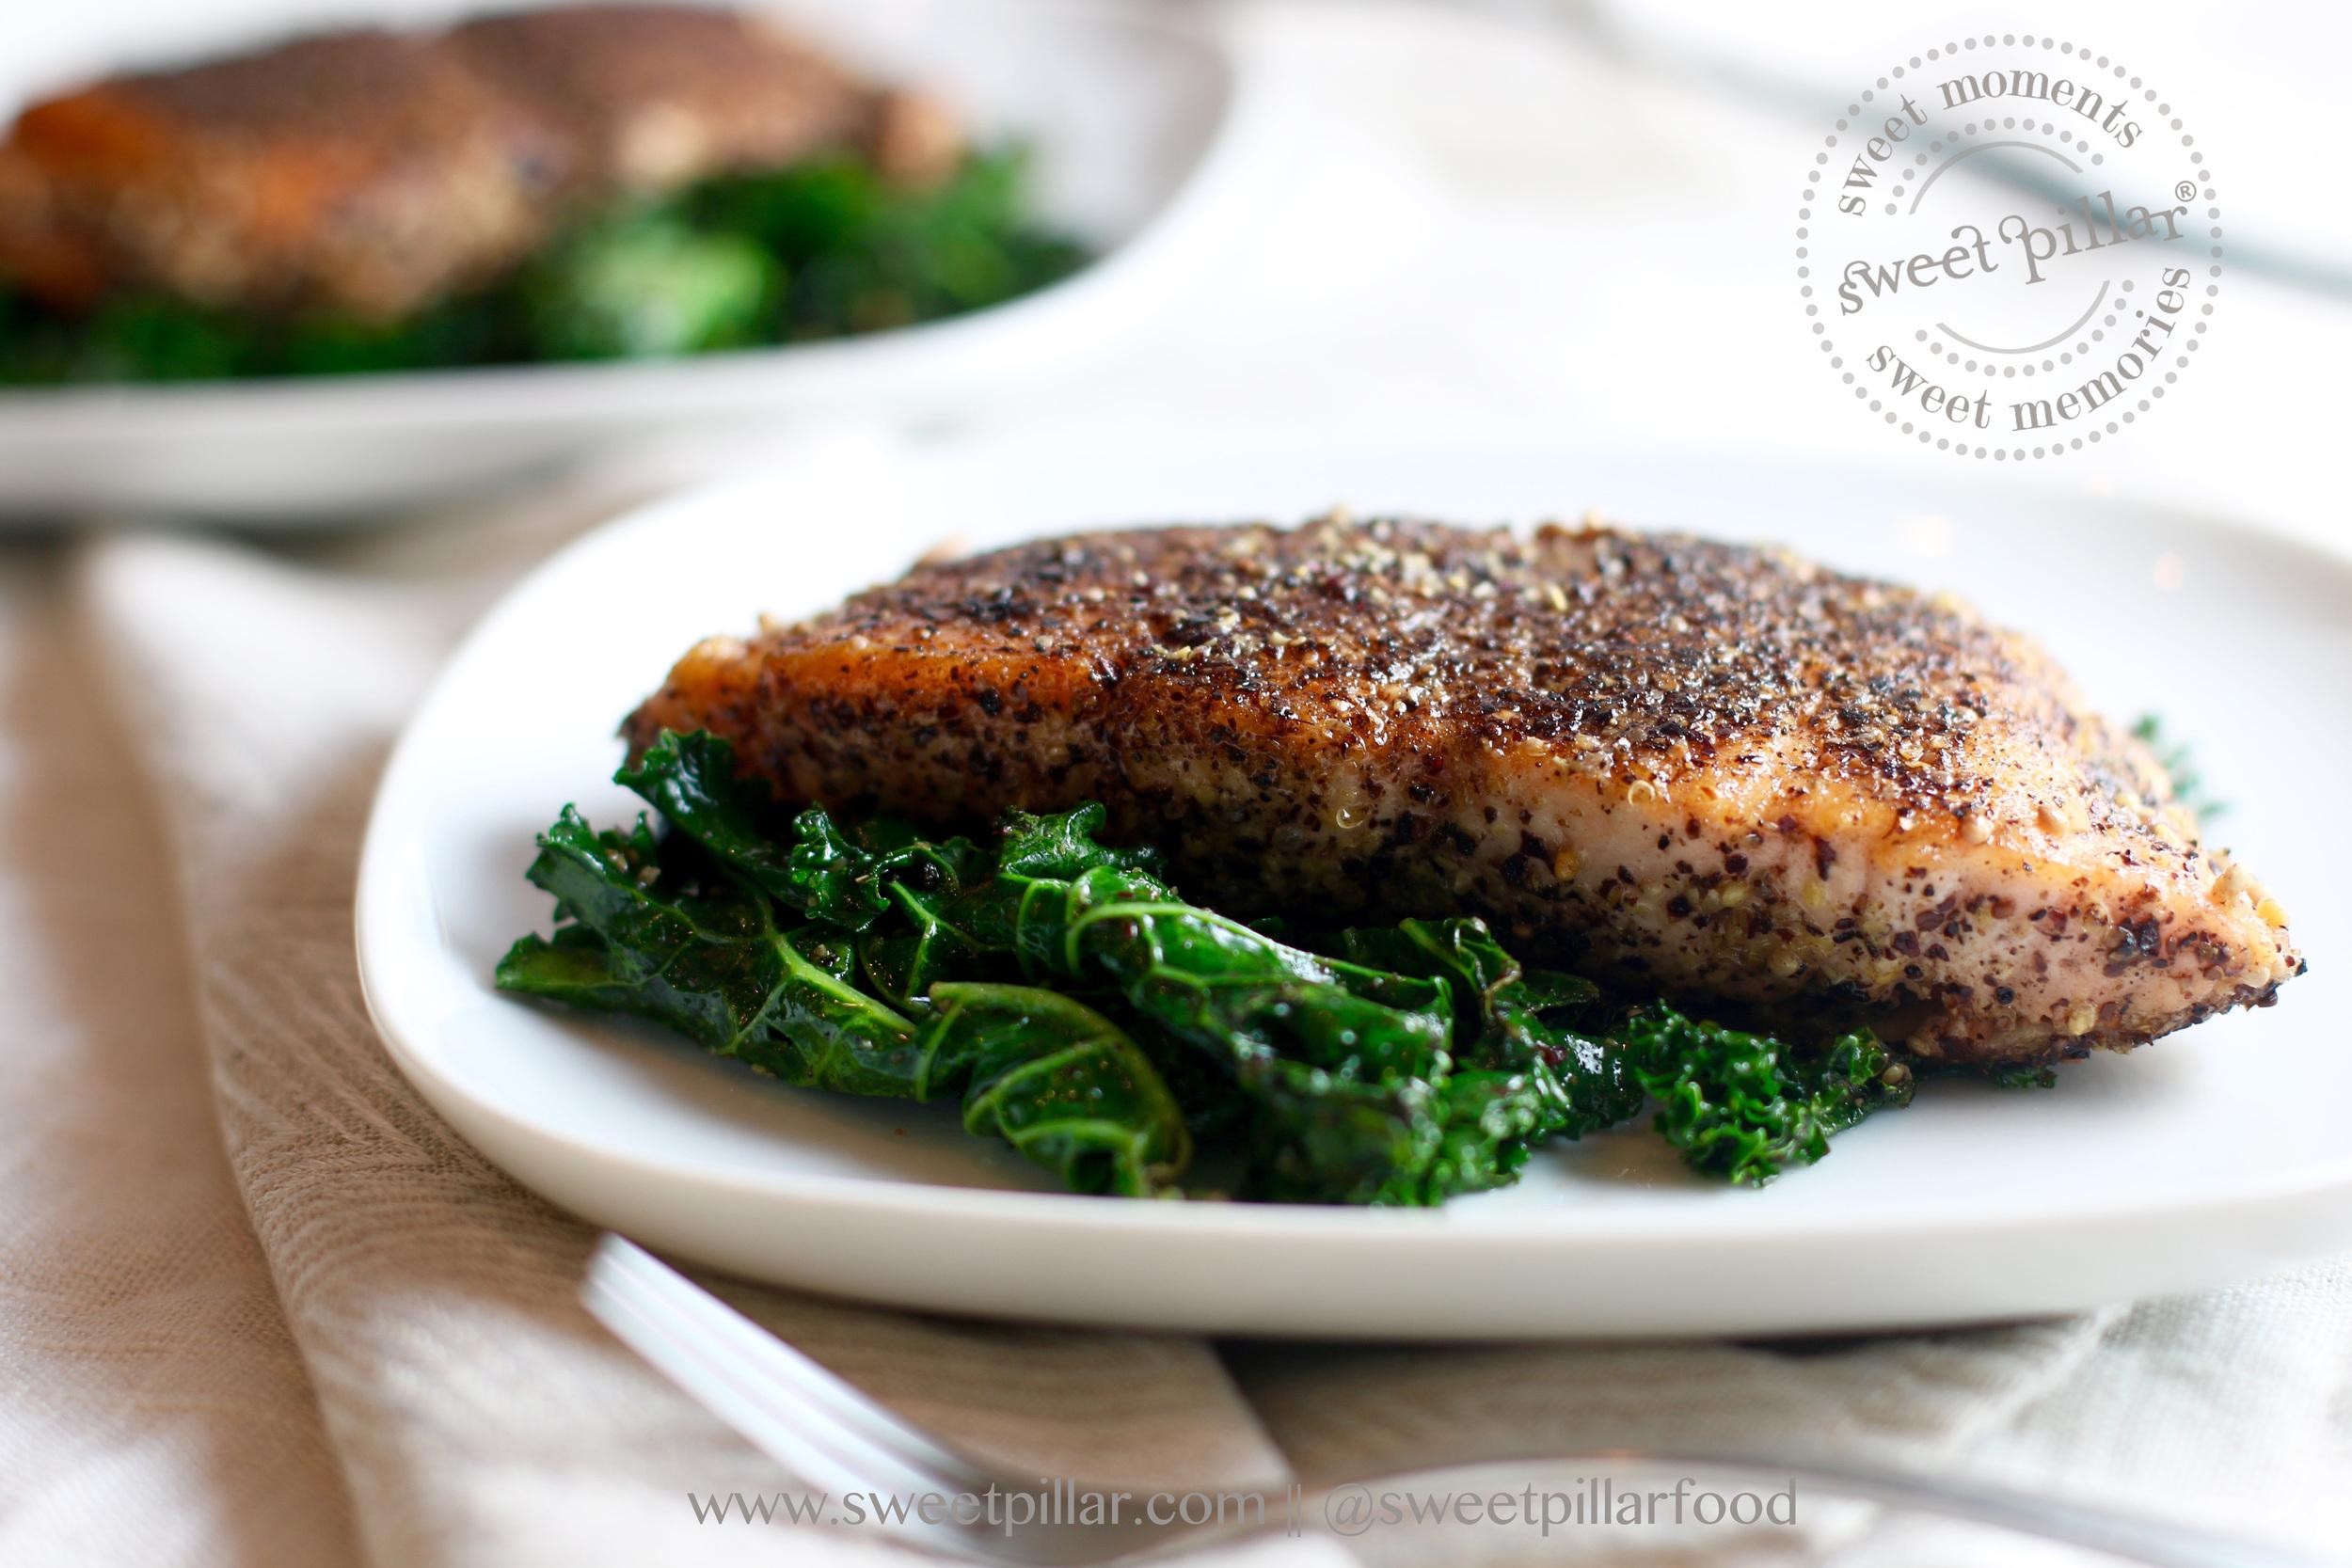 Sautee the kale in the same sumac, cumin, honey mustard rub for a few minutes